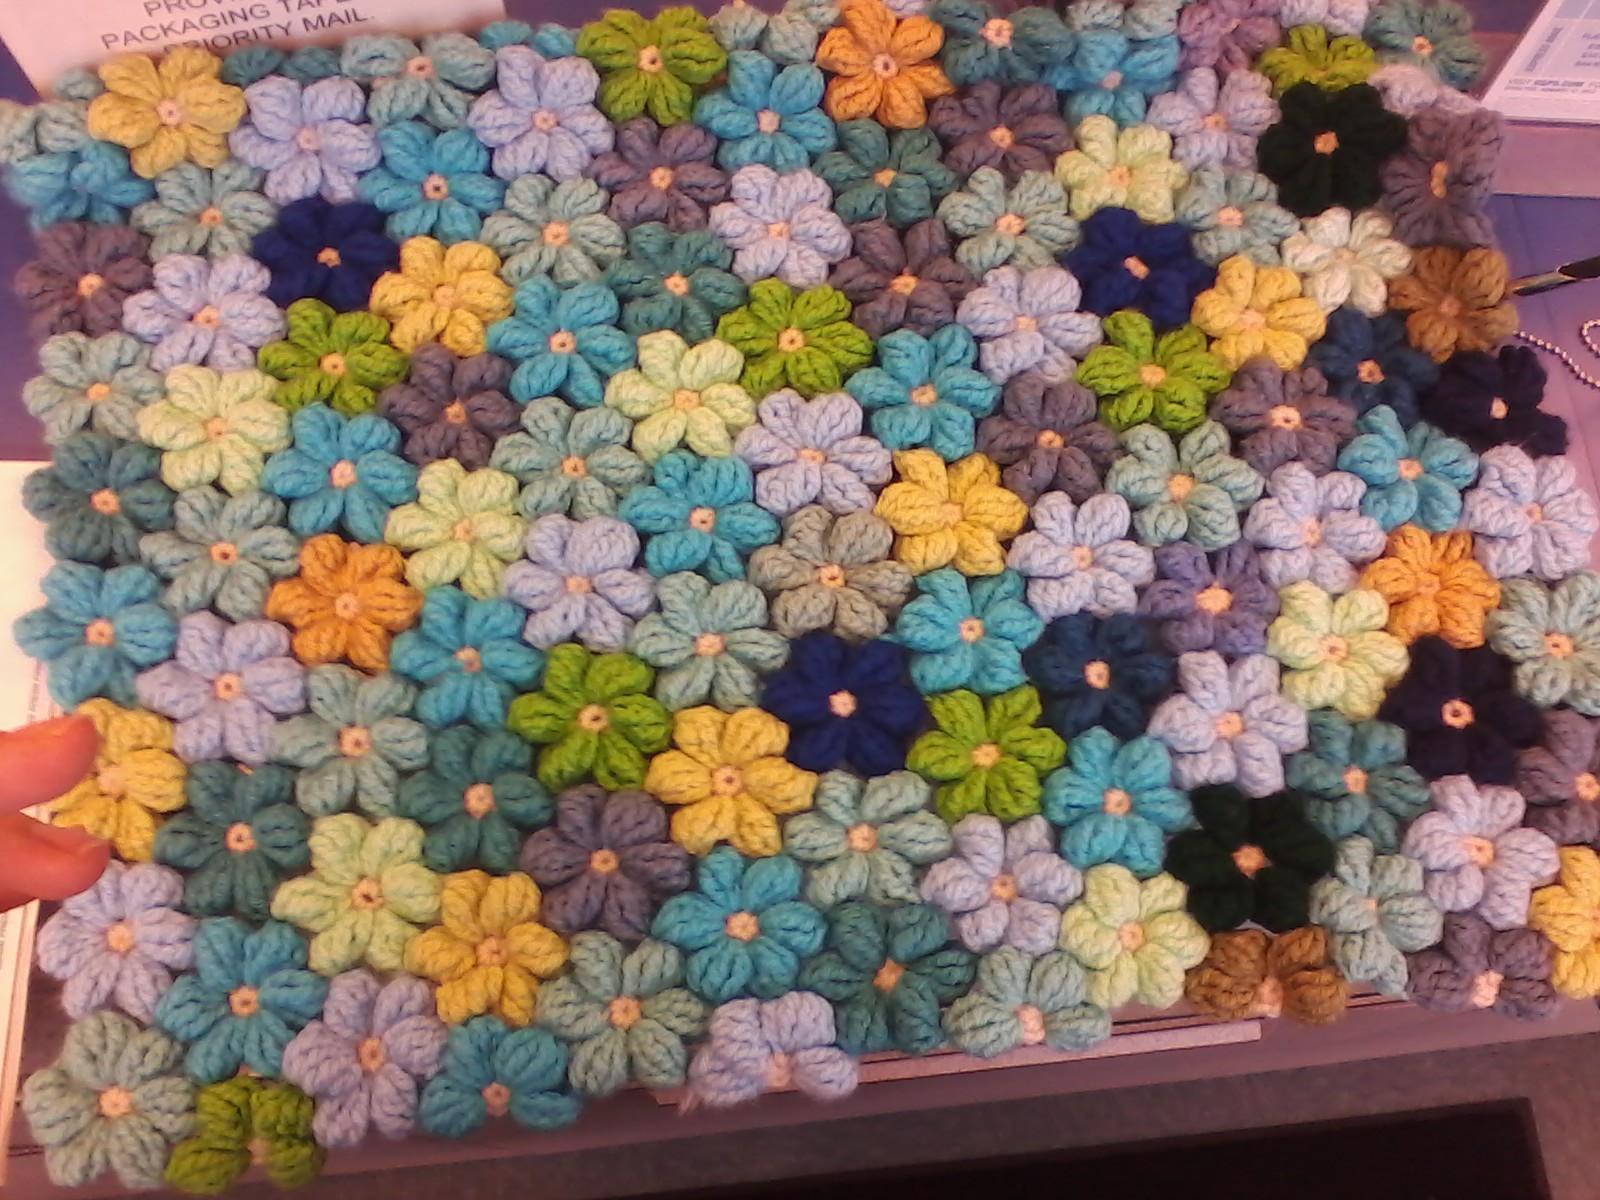 Crochet Flower Pattern Blanket : Adaly Myles Place: FO Floral Blanket